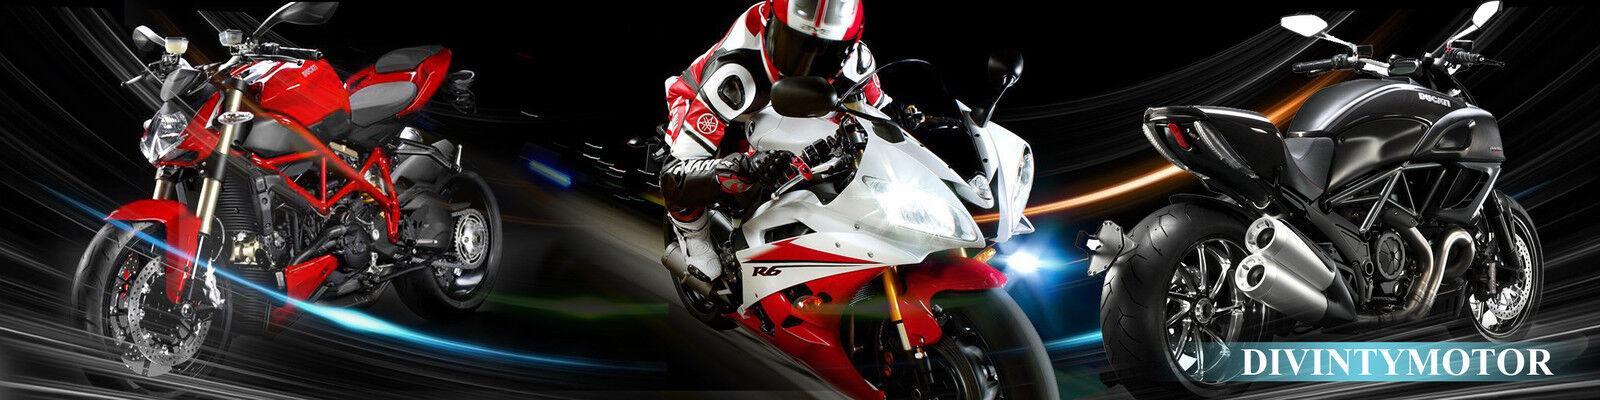 Divinty Racing